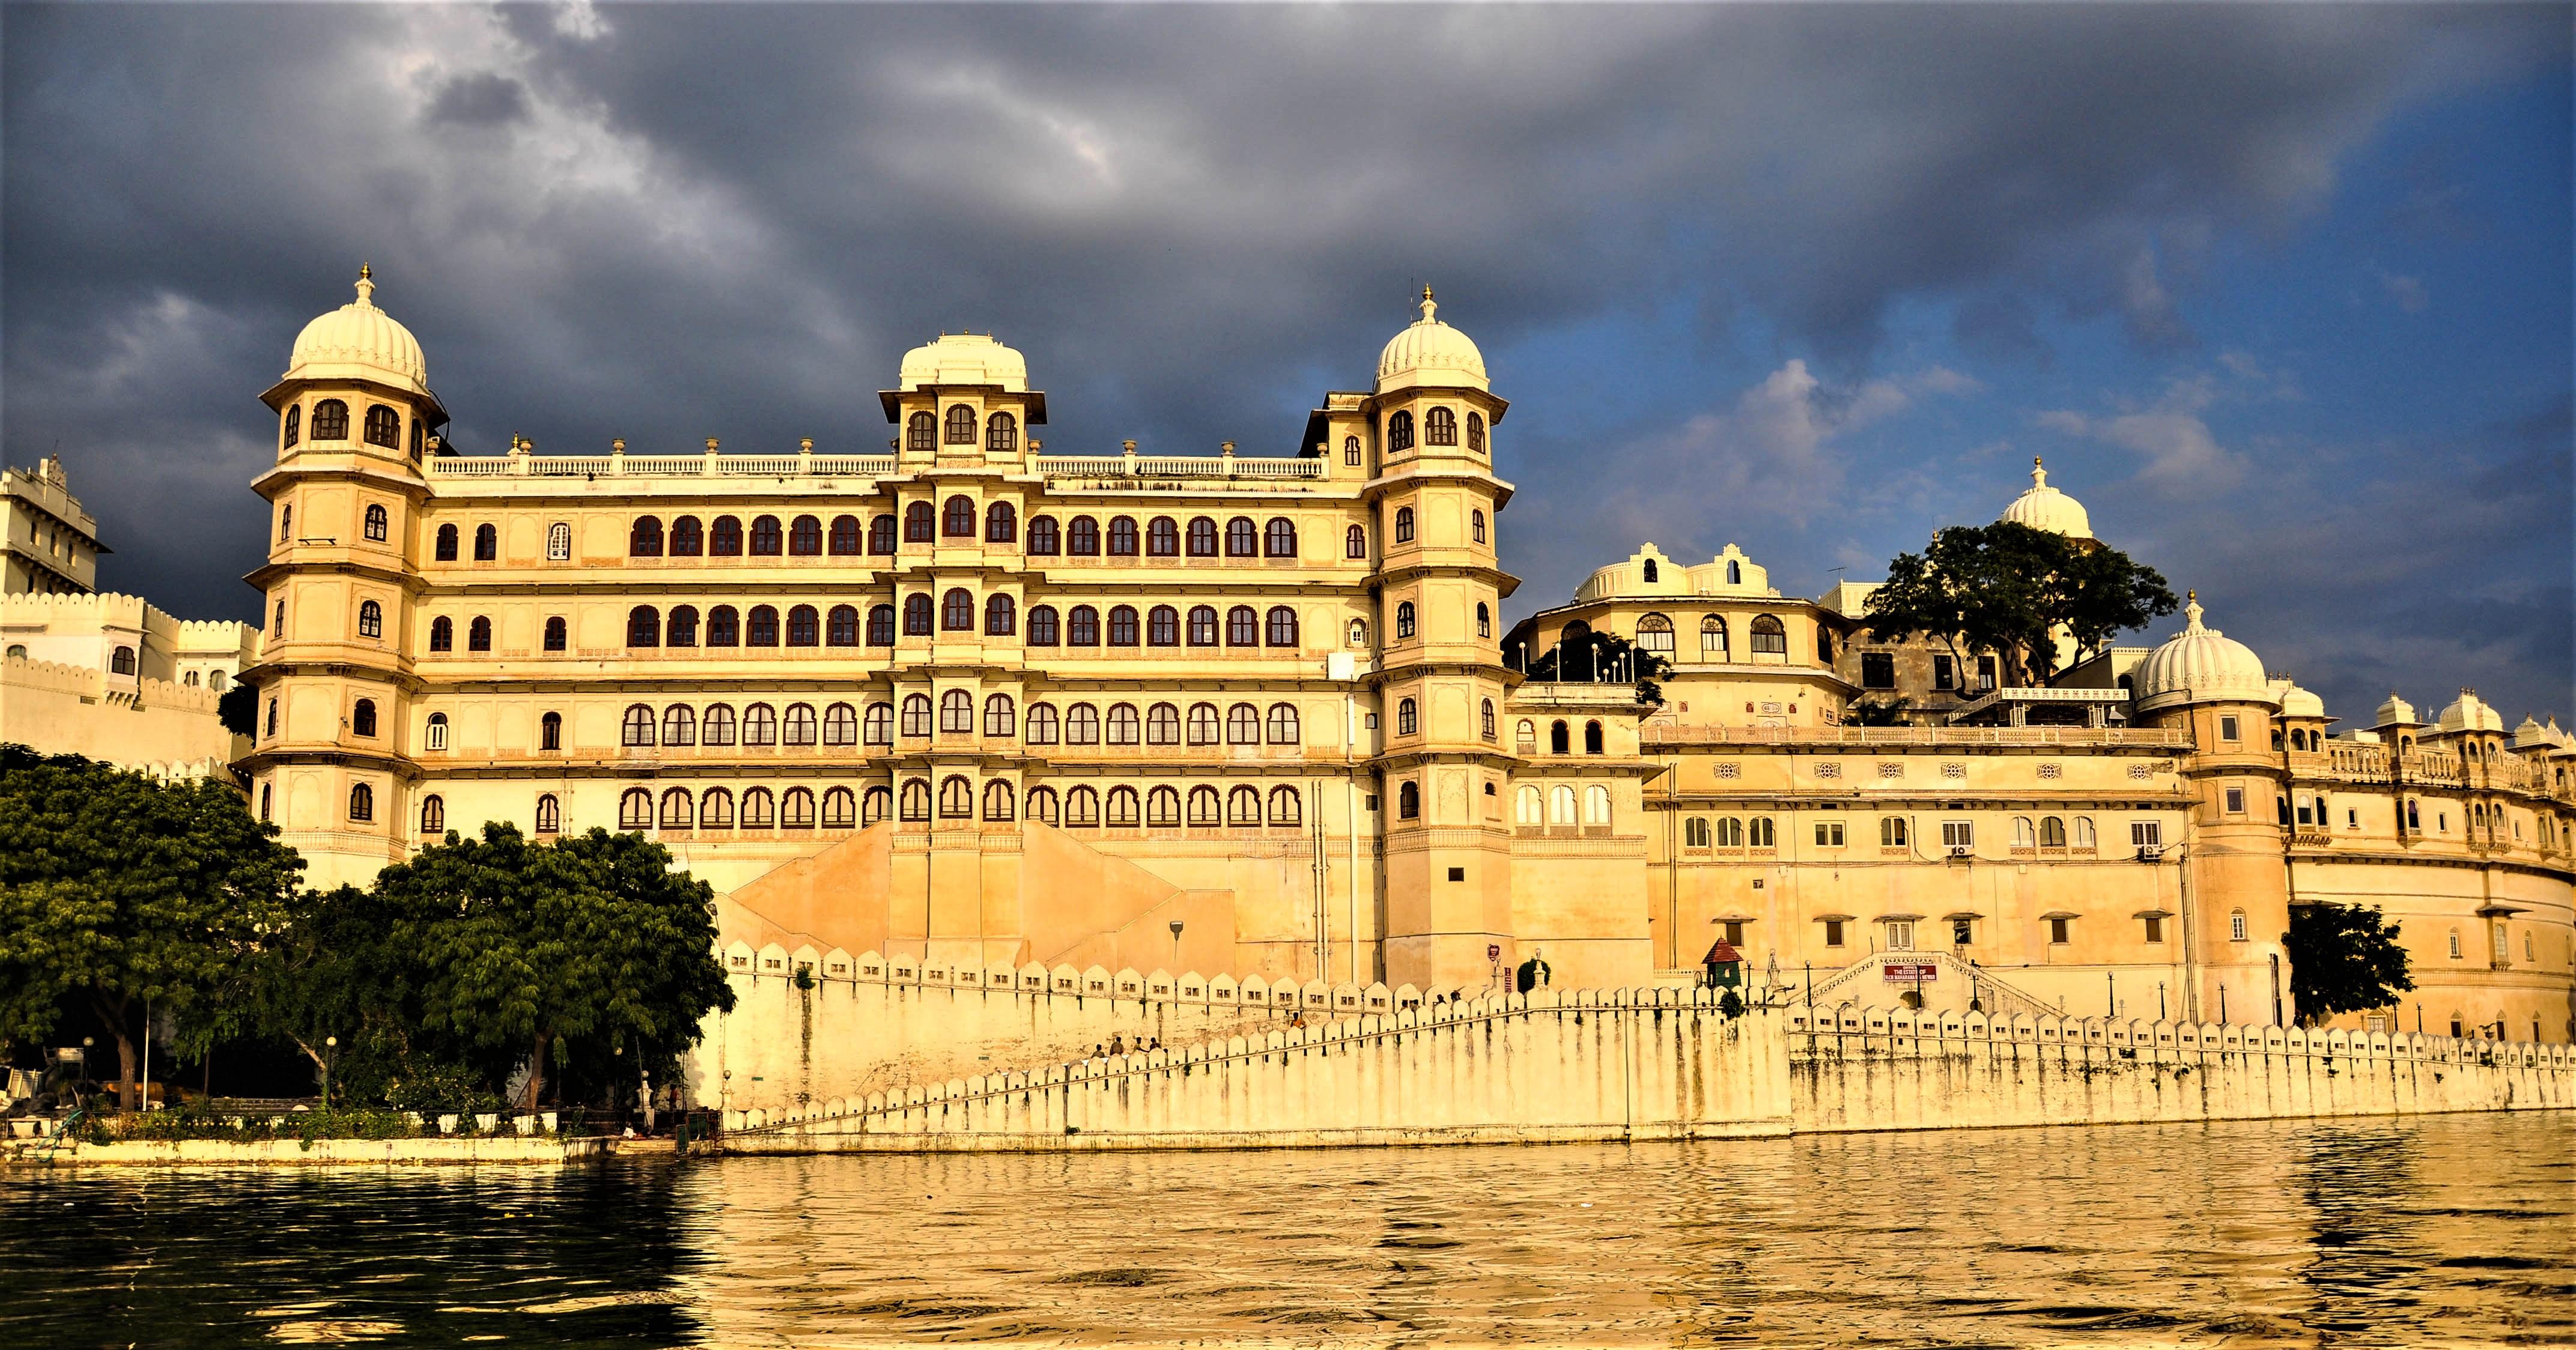 City Palace of Udaipur – City Palace Udaipur – City Palace Udaipur Rajasthan